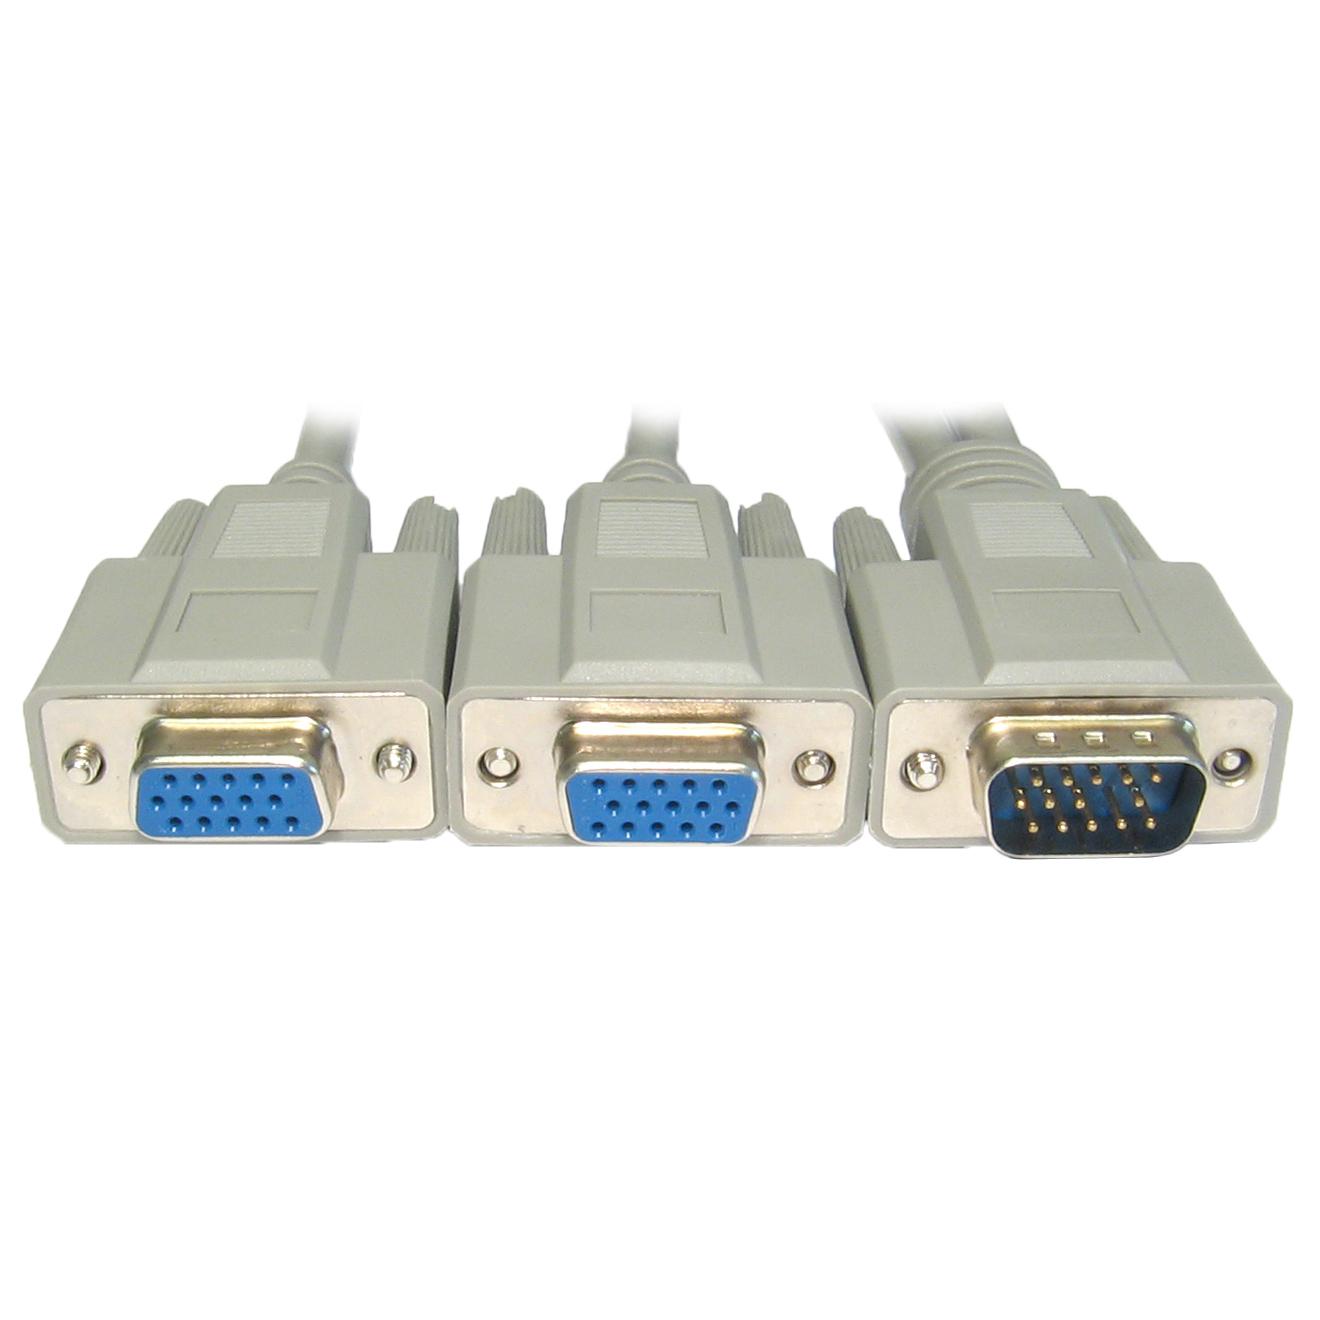 02m 20cm Pc Computer Monitor Svga Vga Y Splitter 2 Port Cable Lead Wire Converter Spliter Thumbnail